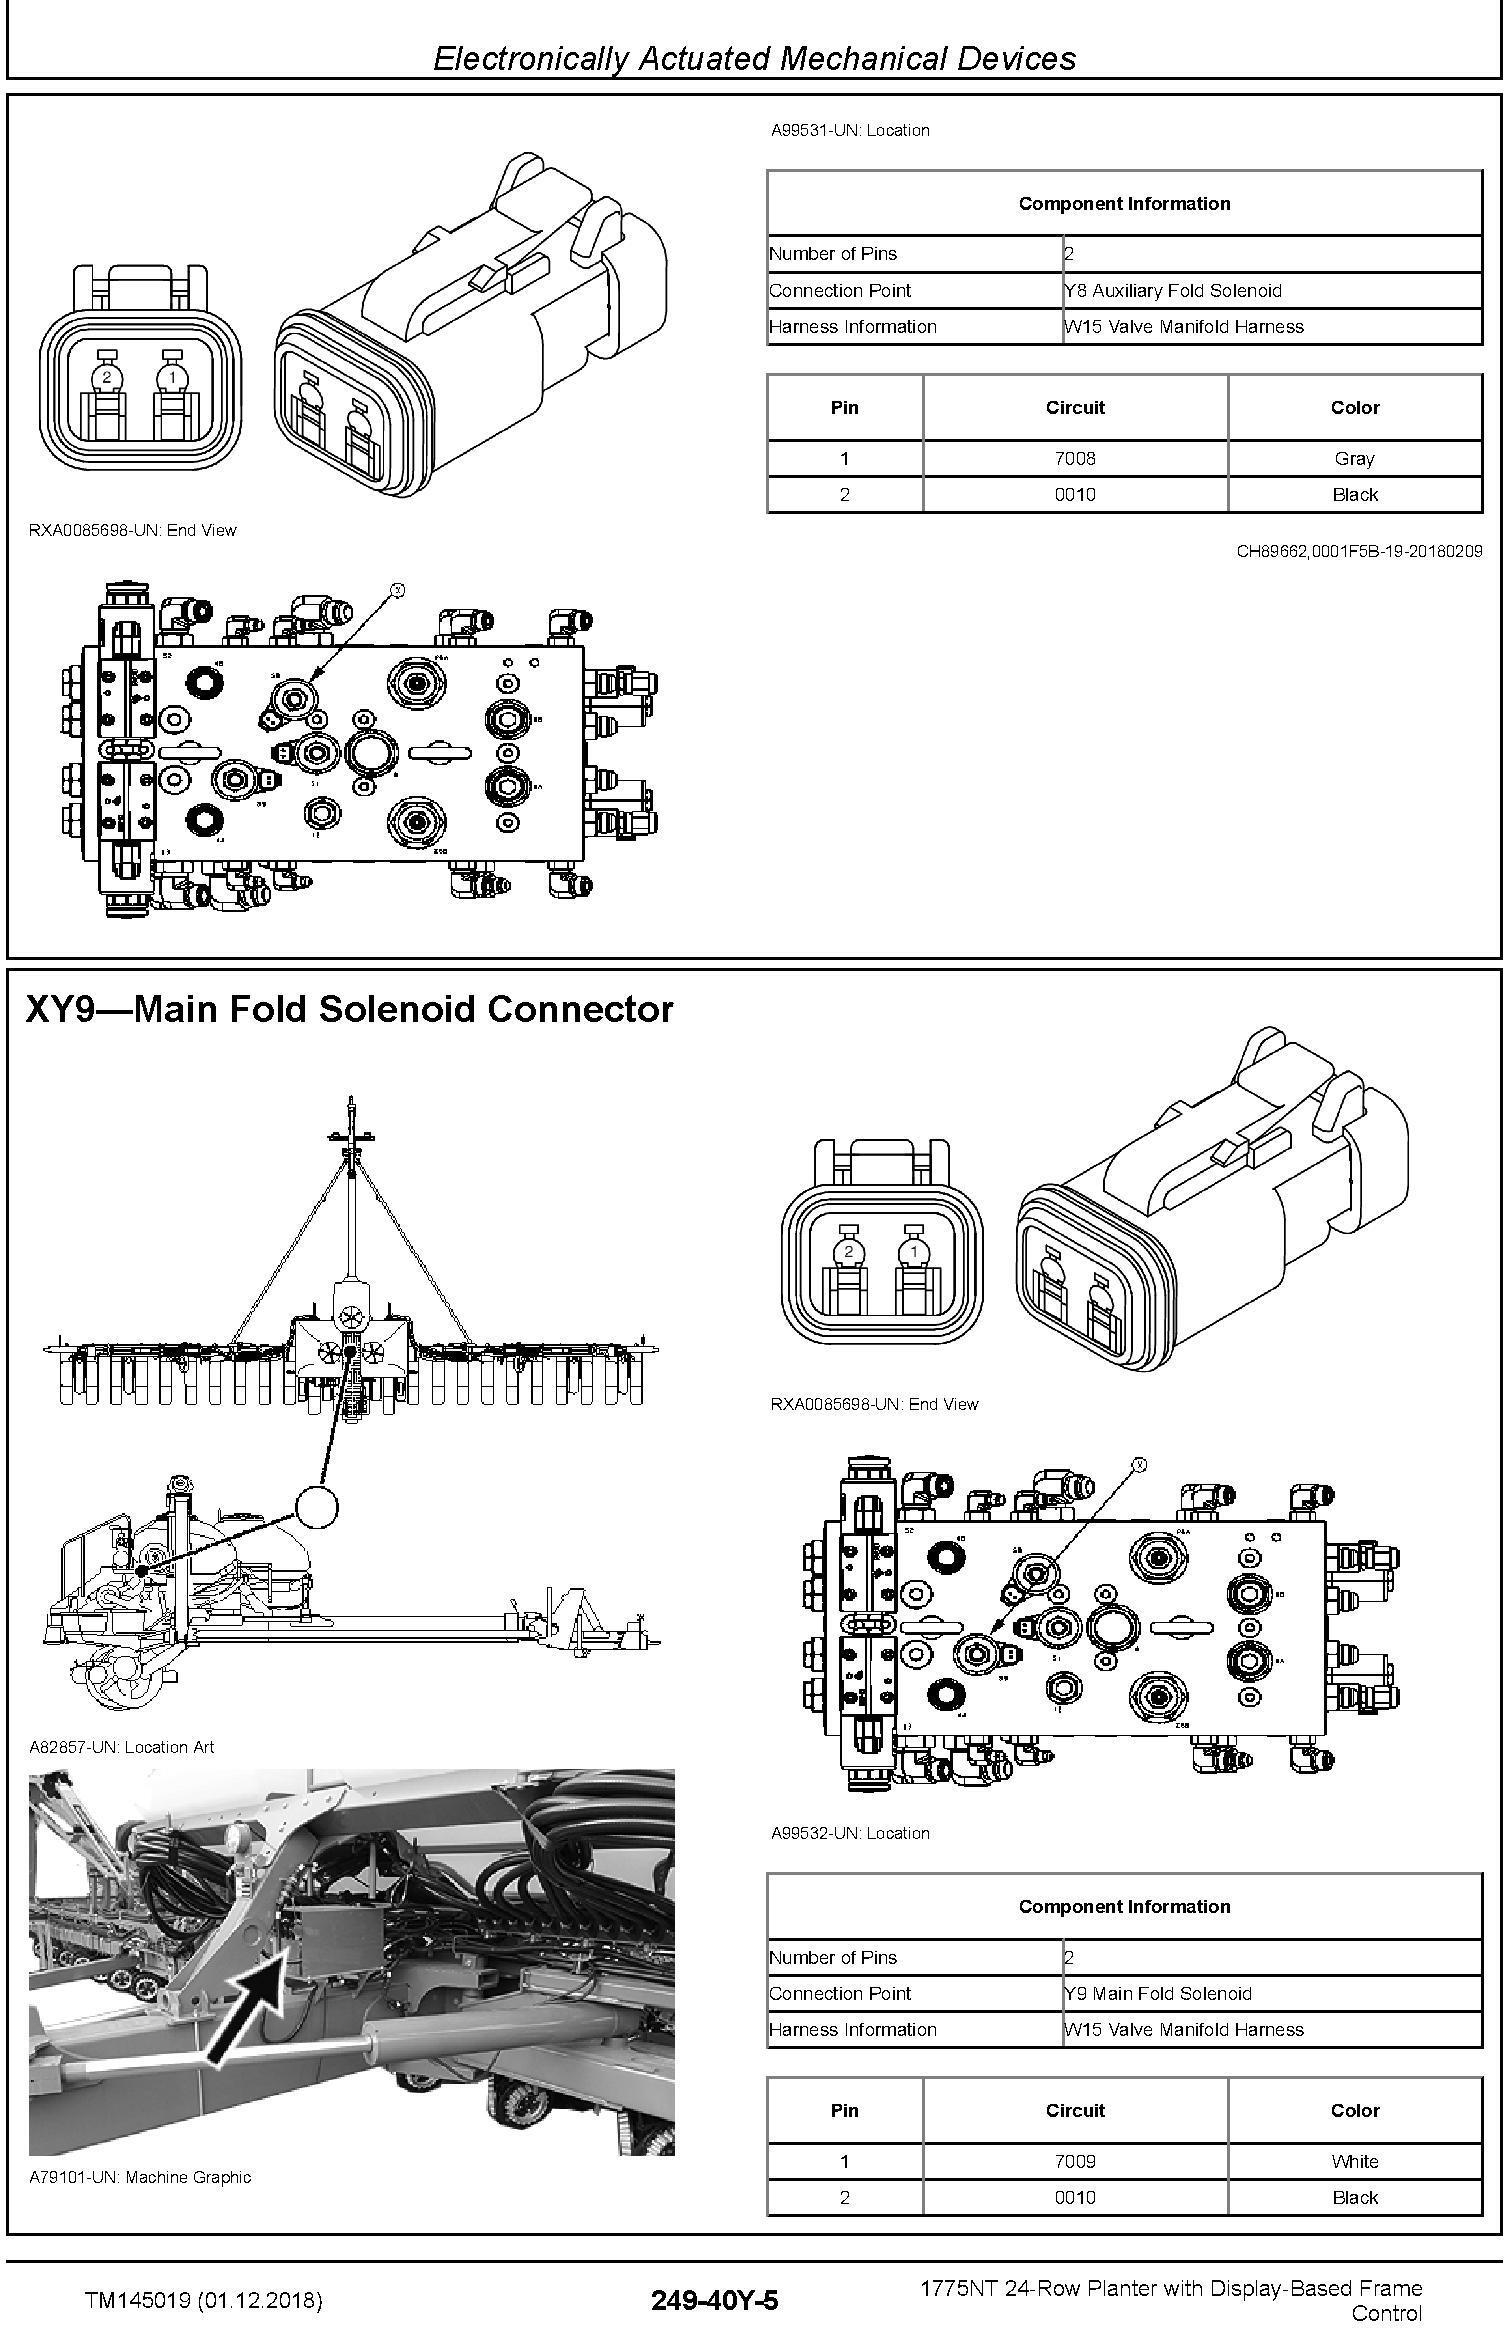 John Deere 1775NT 24row Planter w.Display-Based Frame Control Diagnostic Technical Manual (TM145019) - 3